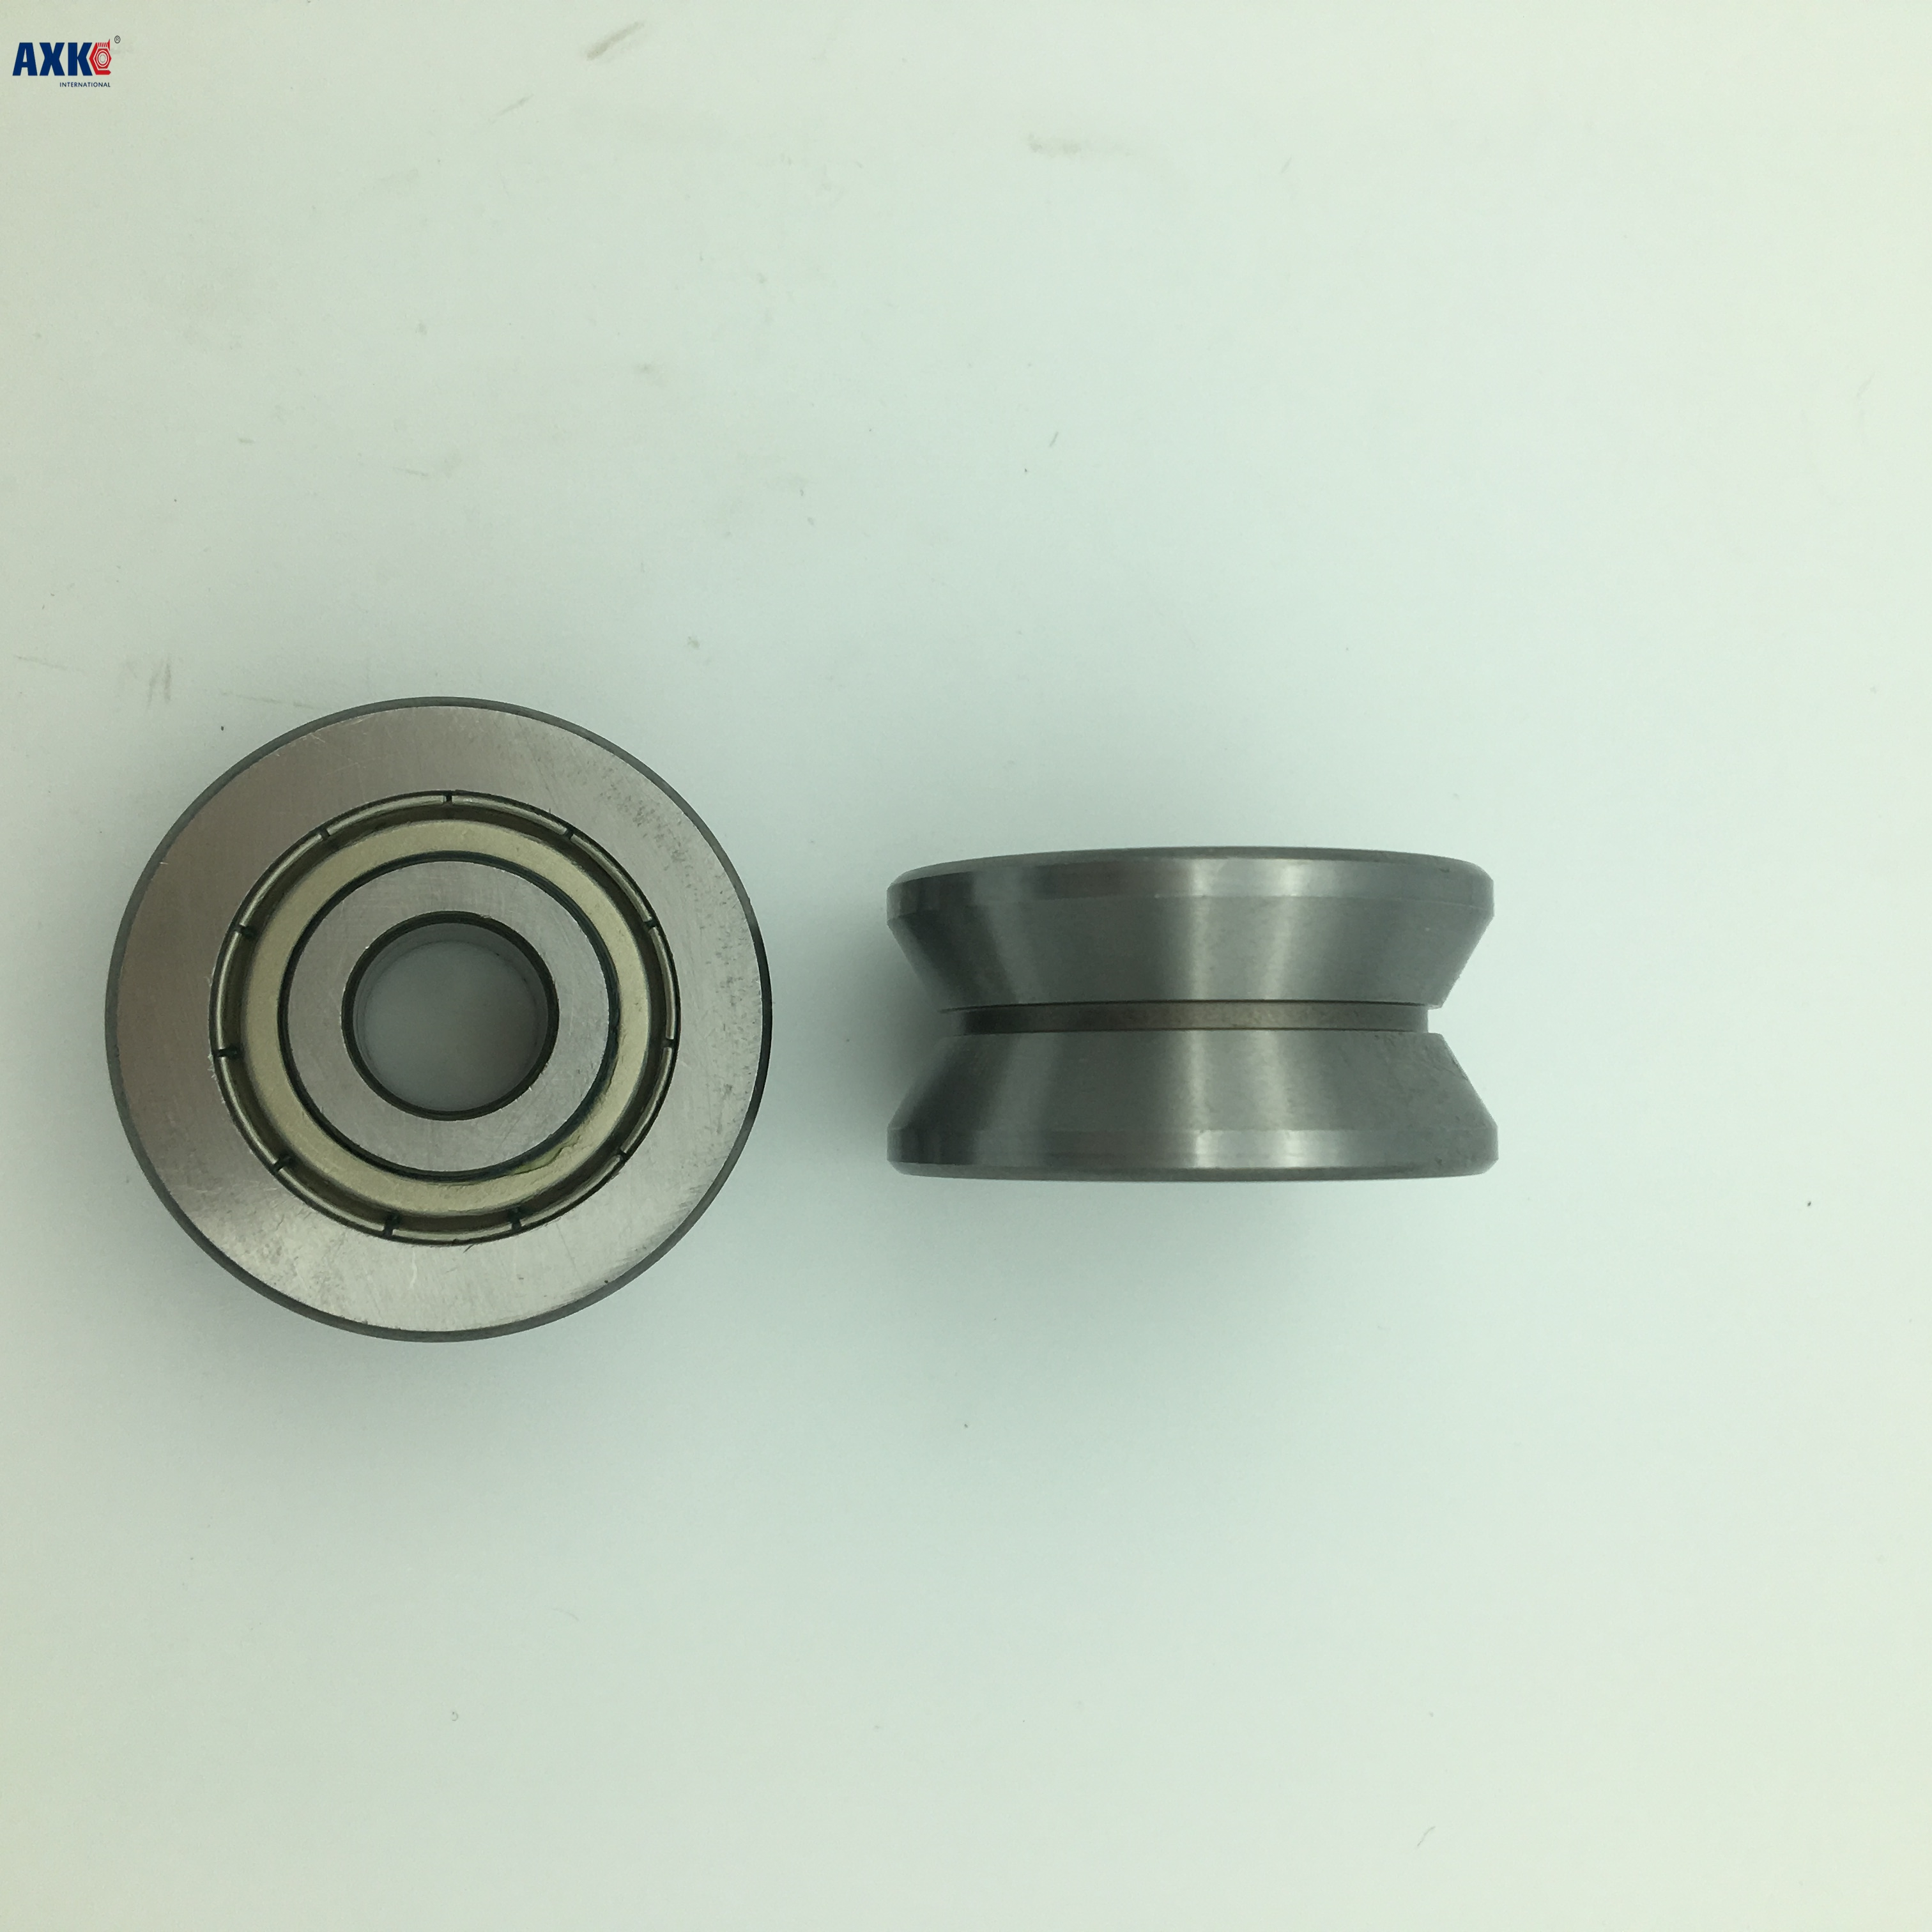 Free shipping high quality TU16 T16  U16 T16.5 ABEC5 6mm pulley bearings 5x16.5x9x11mm U groove roller wheel ball bearing T-U-16 1 piece bu3328 6 6 33 27 5 29 5 mm z25 guide rail u groove plastic roller embedded dual bearing